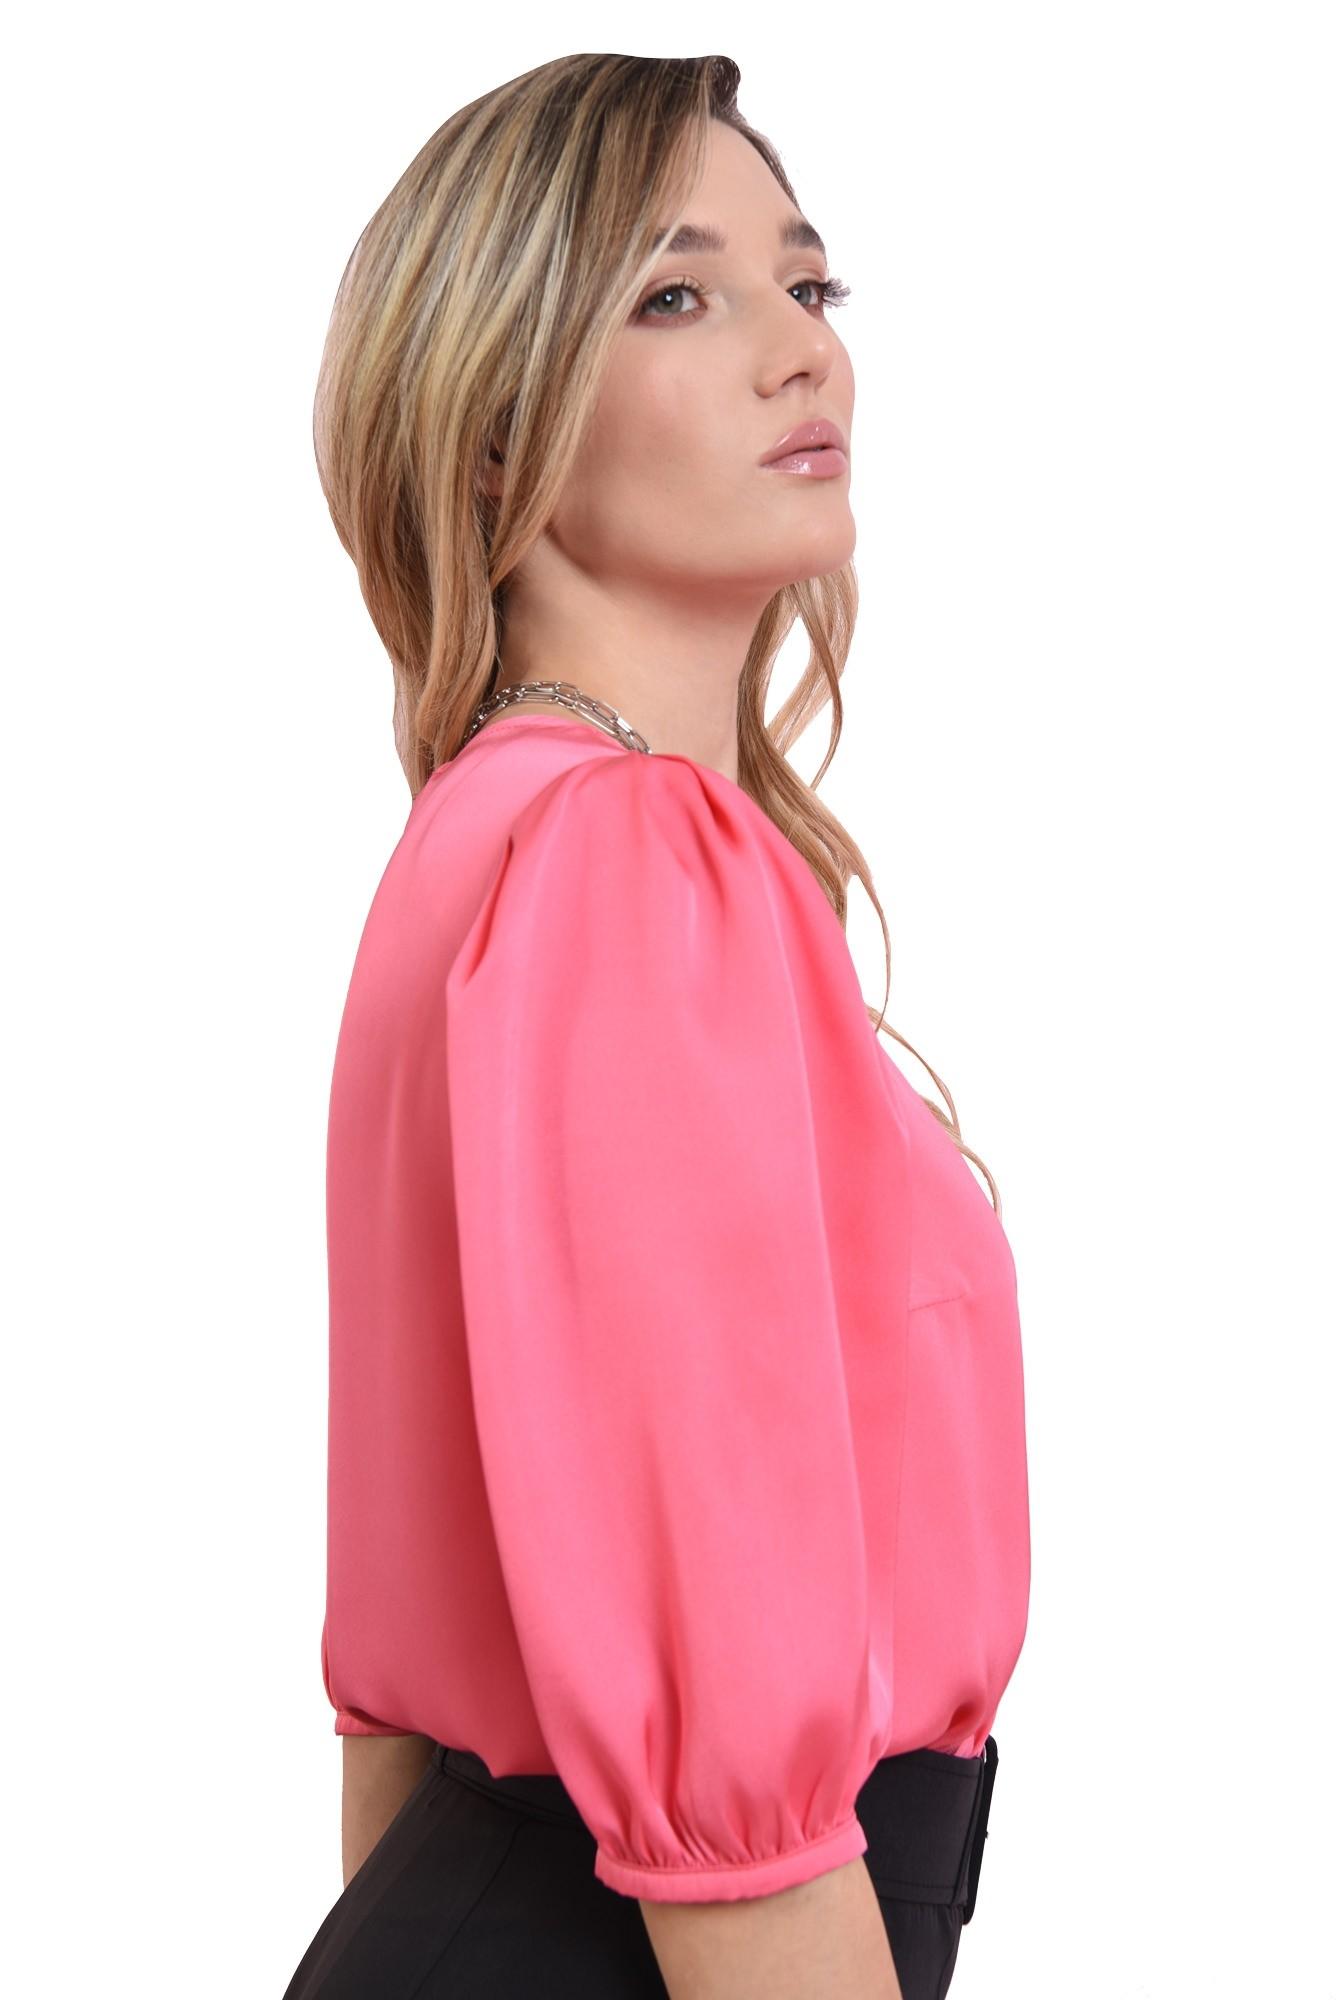 3 - bluza matasoasa, roz, cu maneci bufante